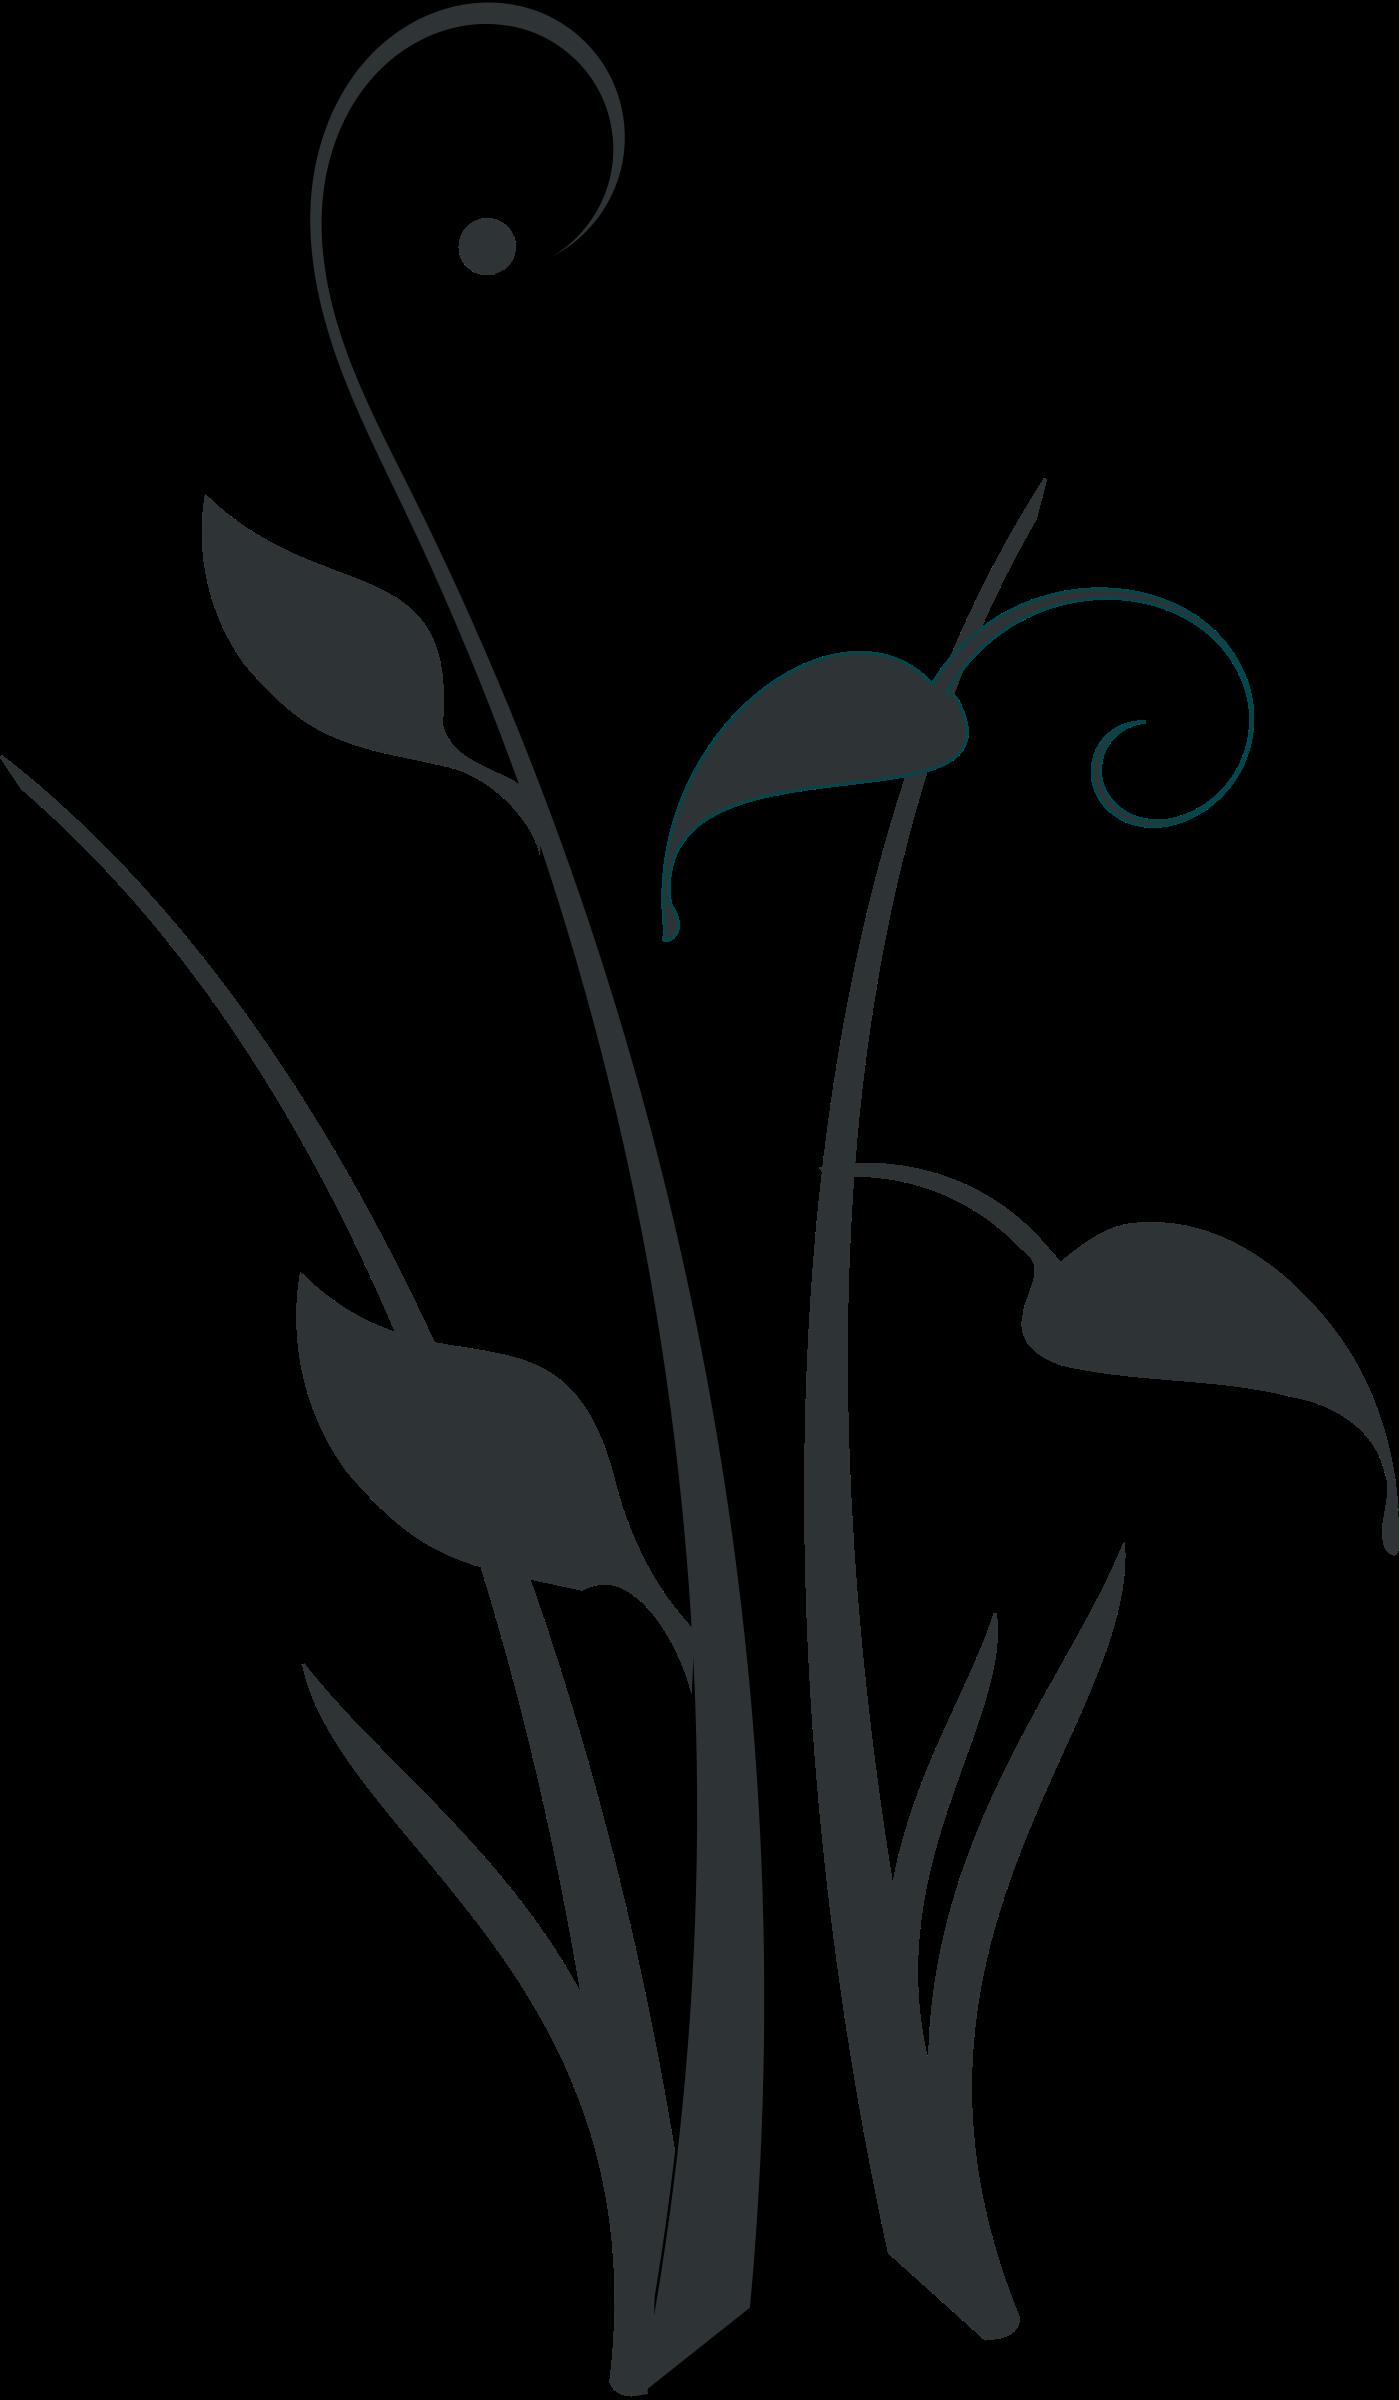 Decorative clipart vine. Form big image png